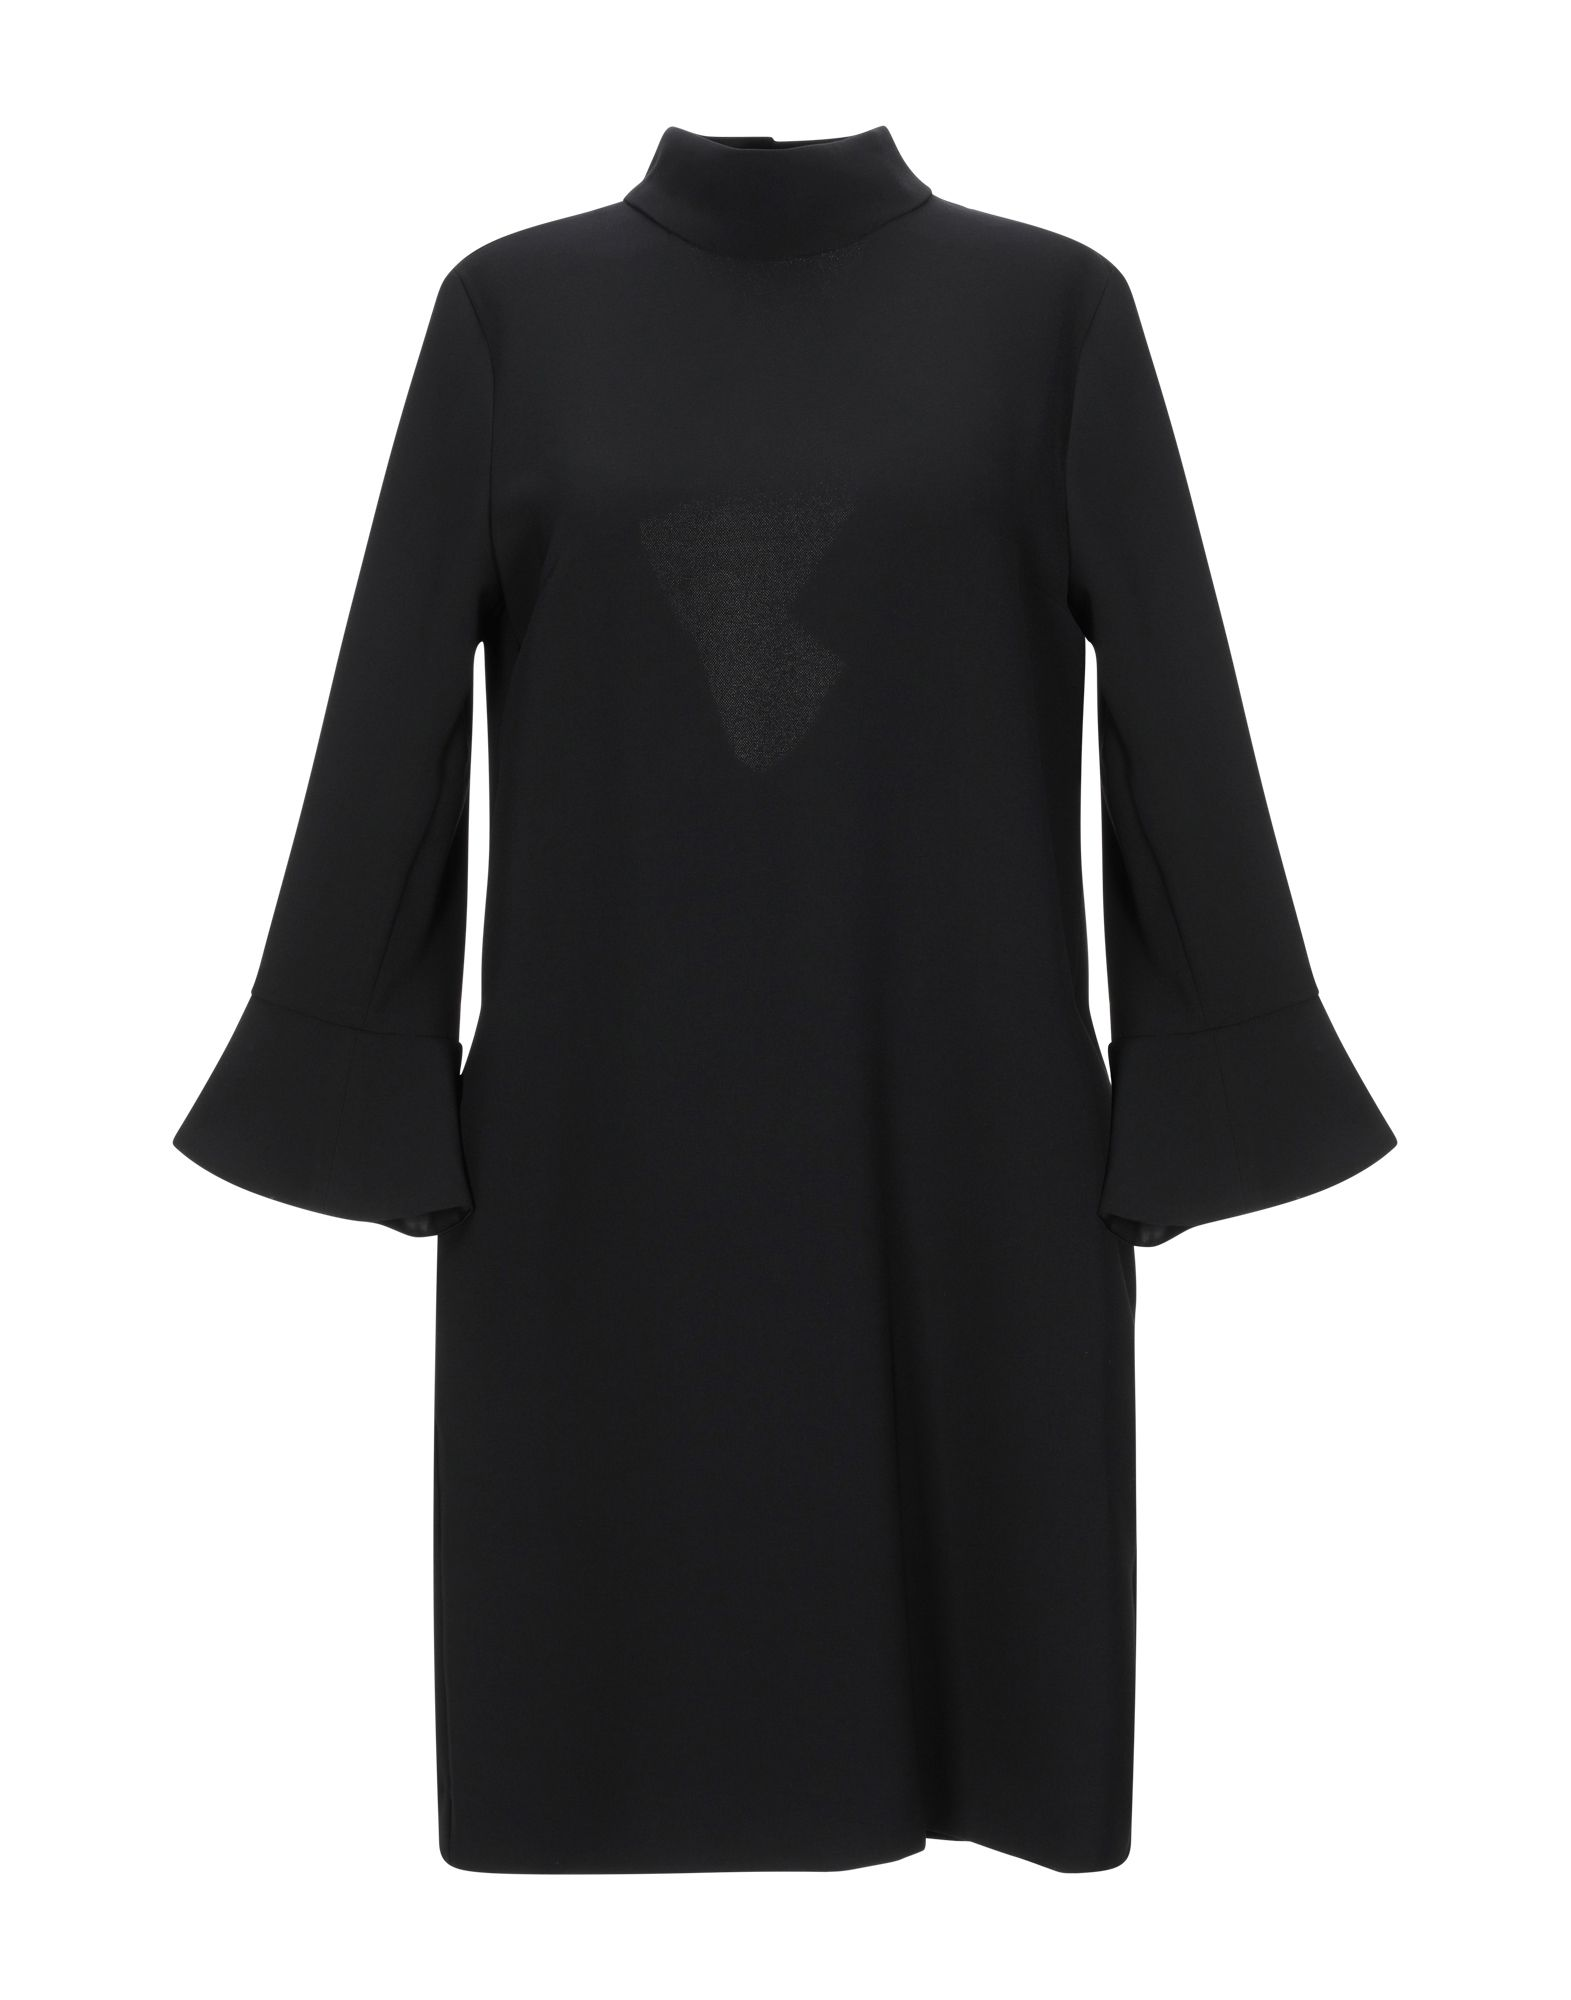 цена COMPAGNIA ITALIANA Короткое платье в интернет-магазинах